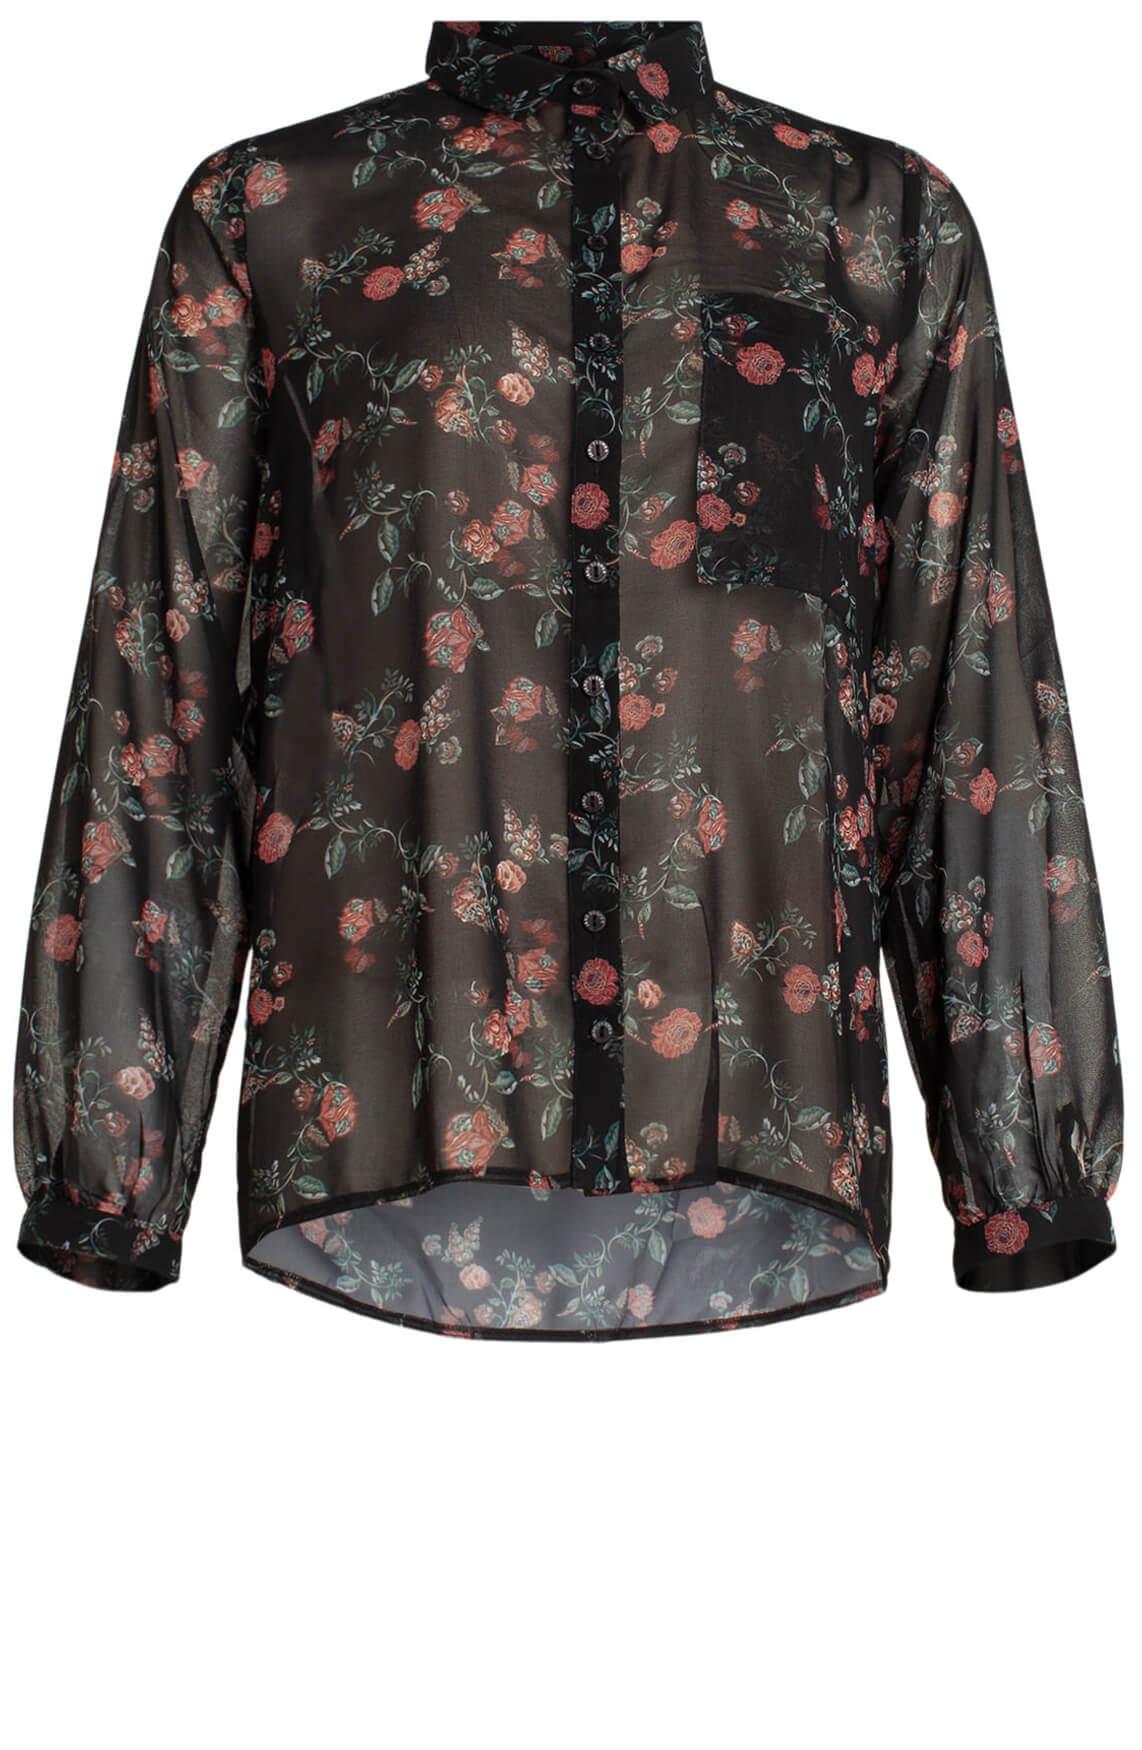 Jane Lushka Dames Blouse met bloemenprint zwart